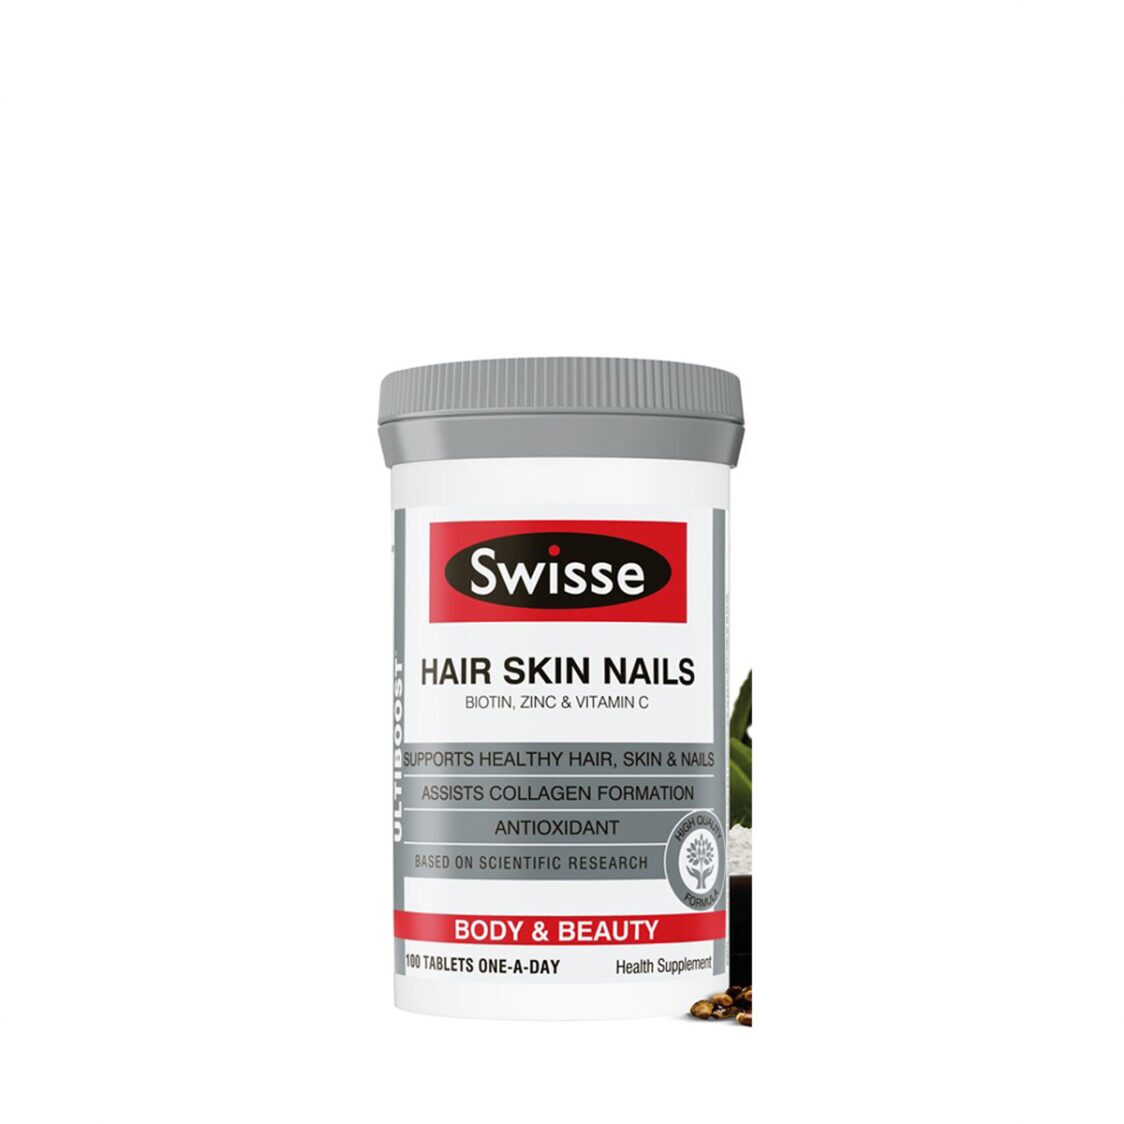 Swisse Ultiboost Hair Skin Nails 100s